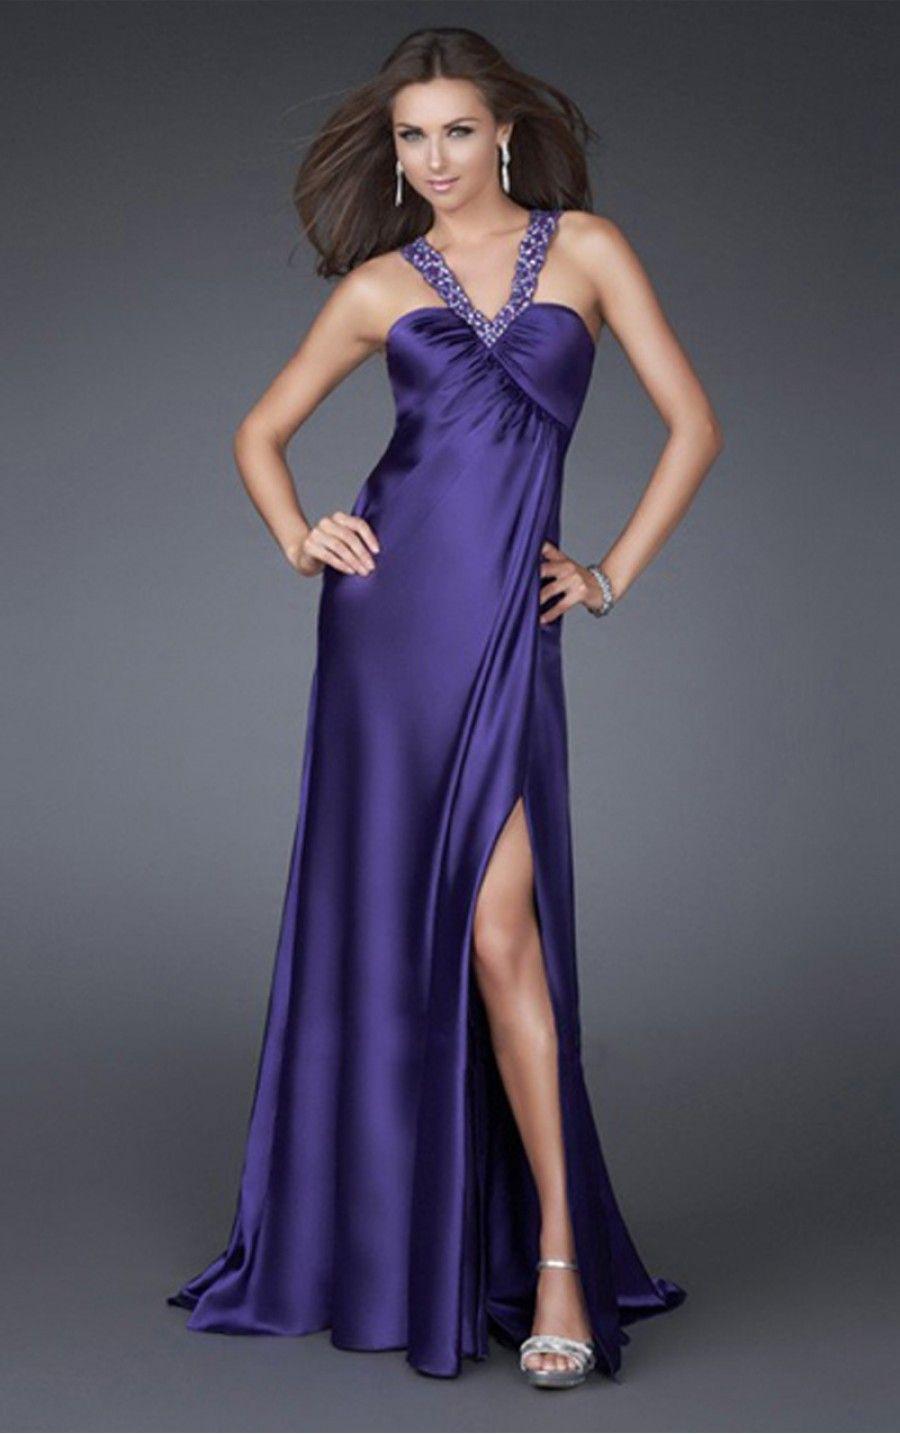 Purple A-line Floor-length V-neck Dress | Maxi robes | Pinterest